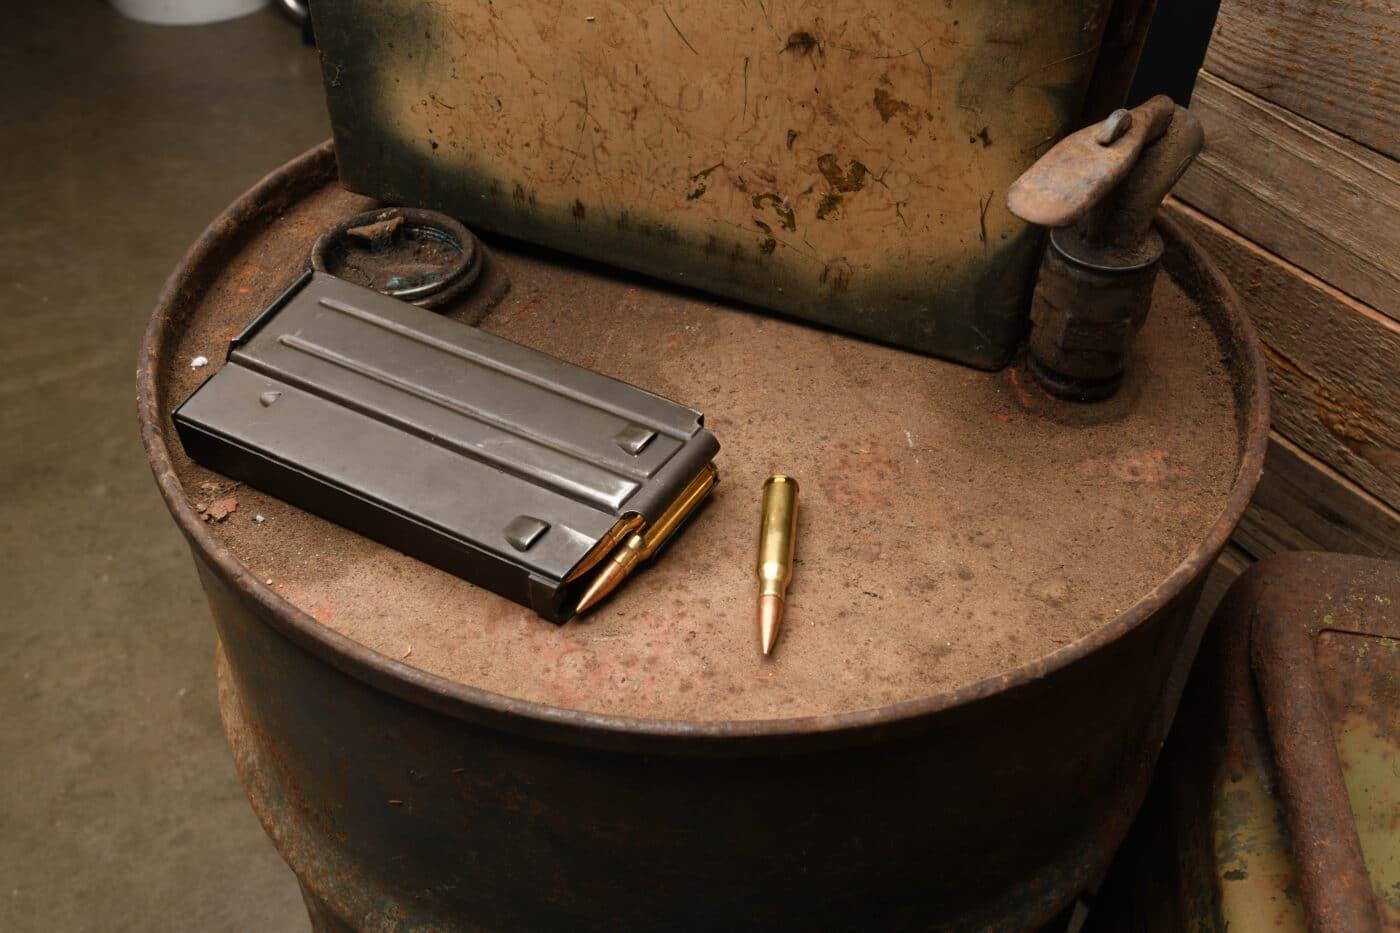 BM59 magazine and ammo